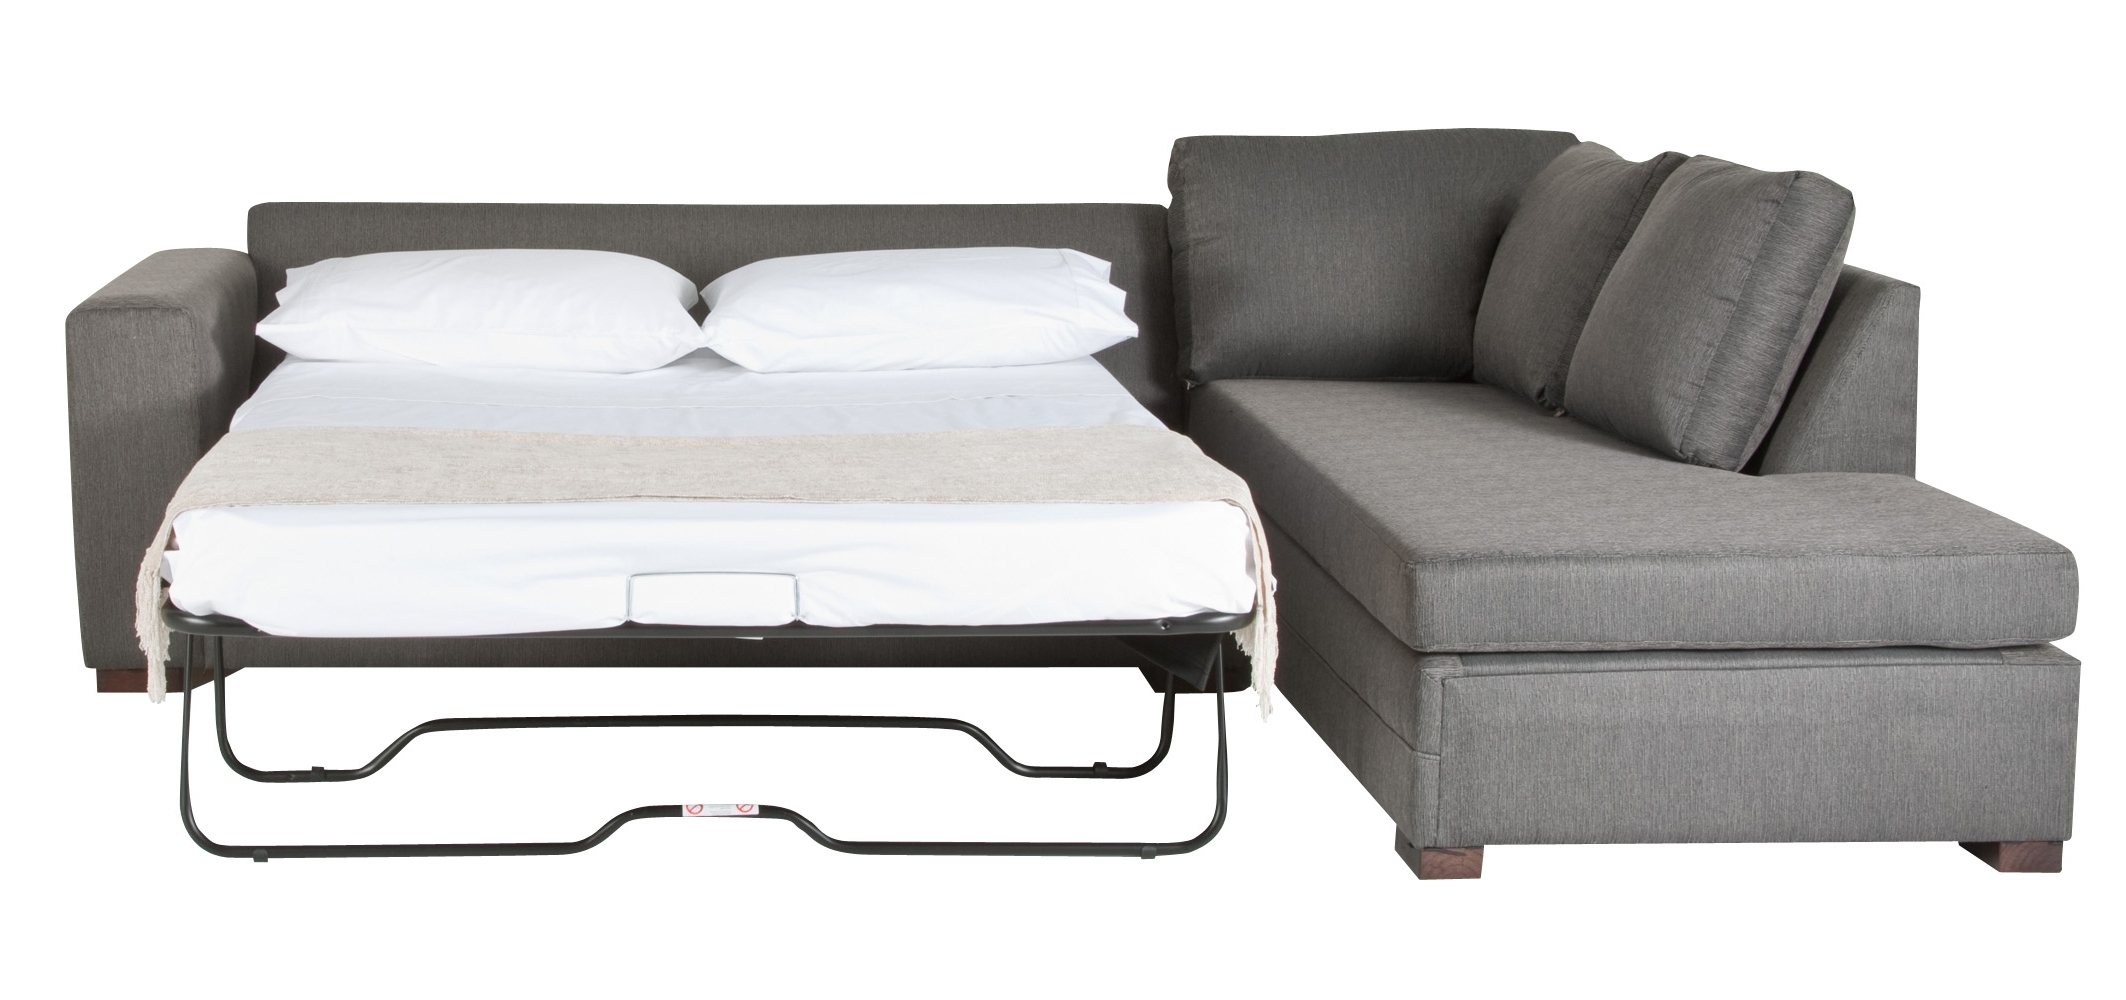 Aifaresidency Throughout Ikea Loveseat Sleeper Sofas (View 13 of 15)